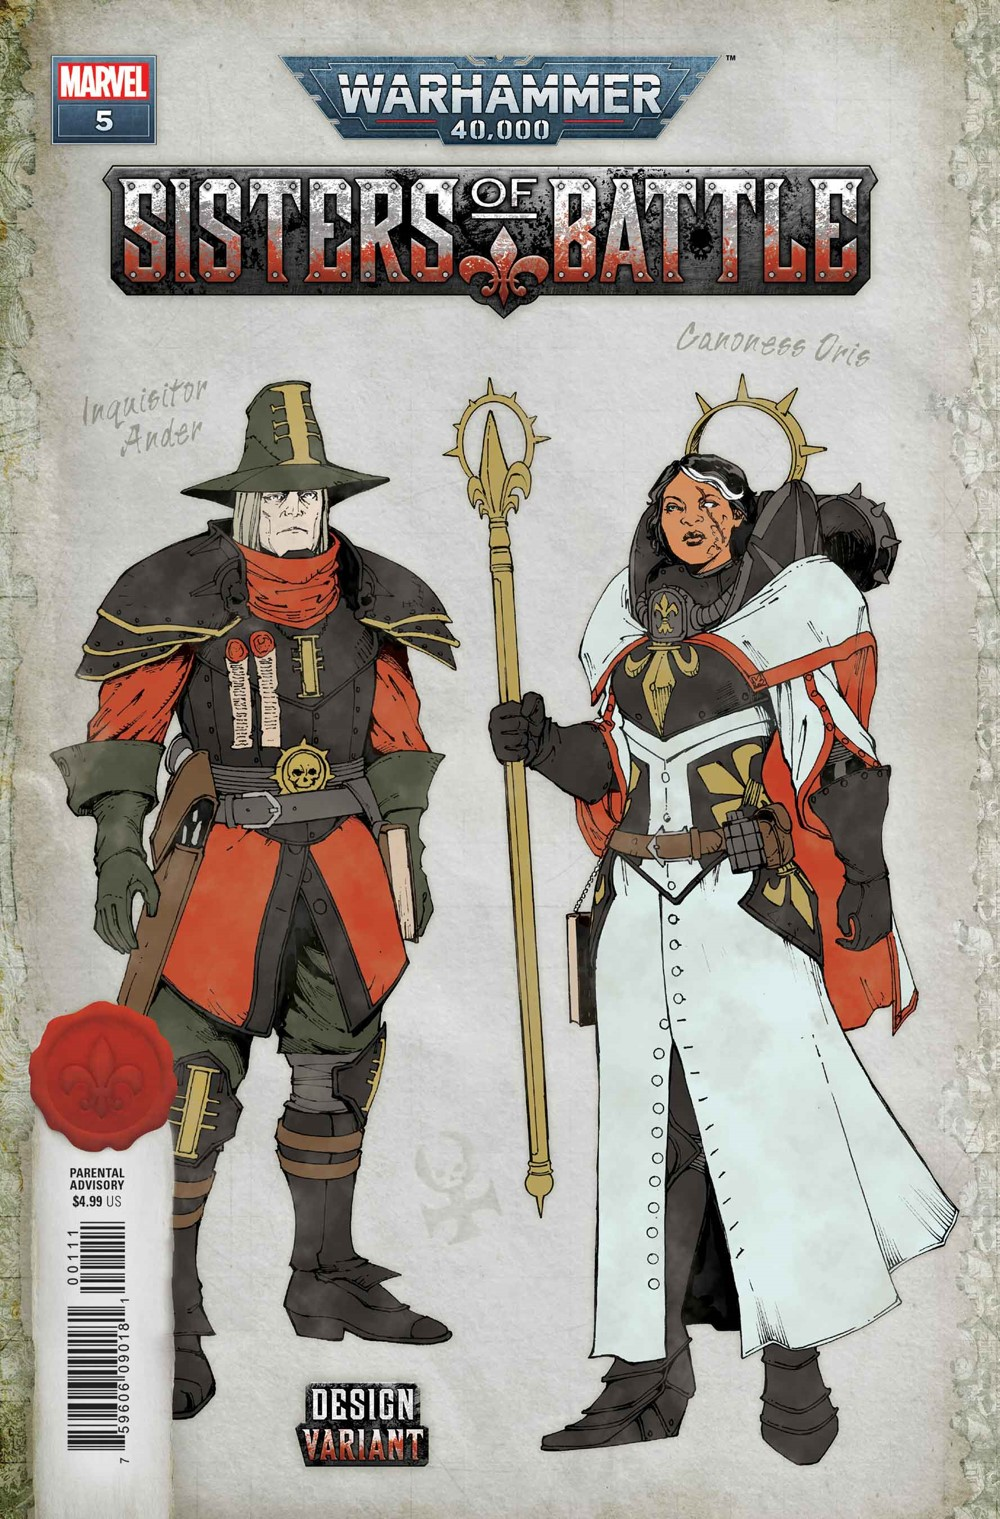 WARHAMMERSOB2021005_design_var Marvel Comics December 2021 Solicitations